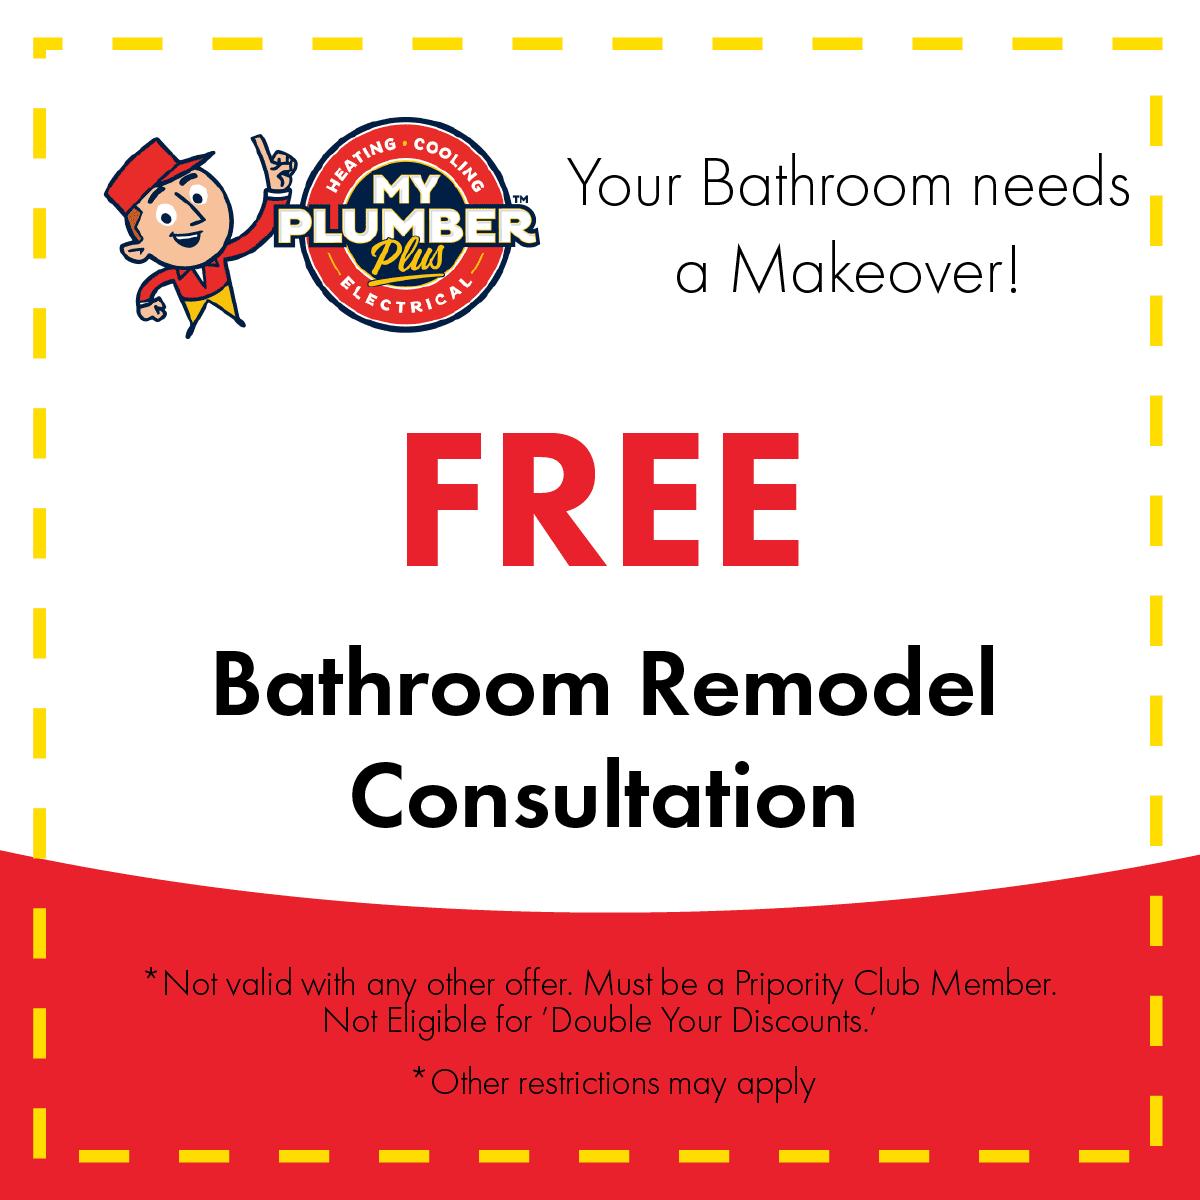 Bathroom Remodel Coupon